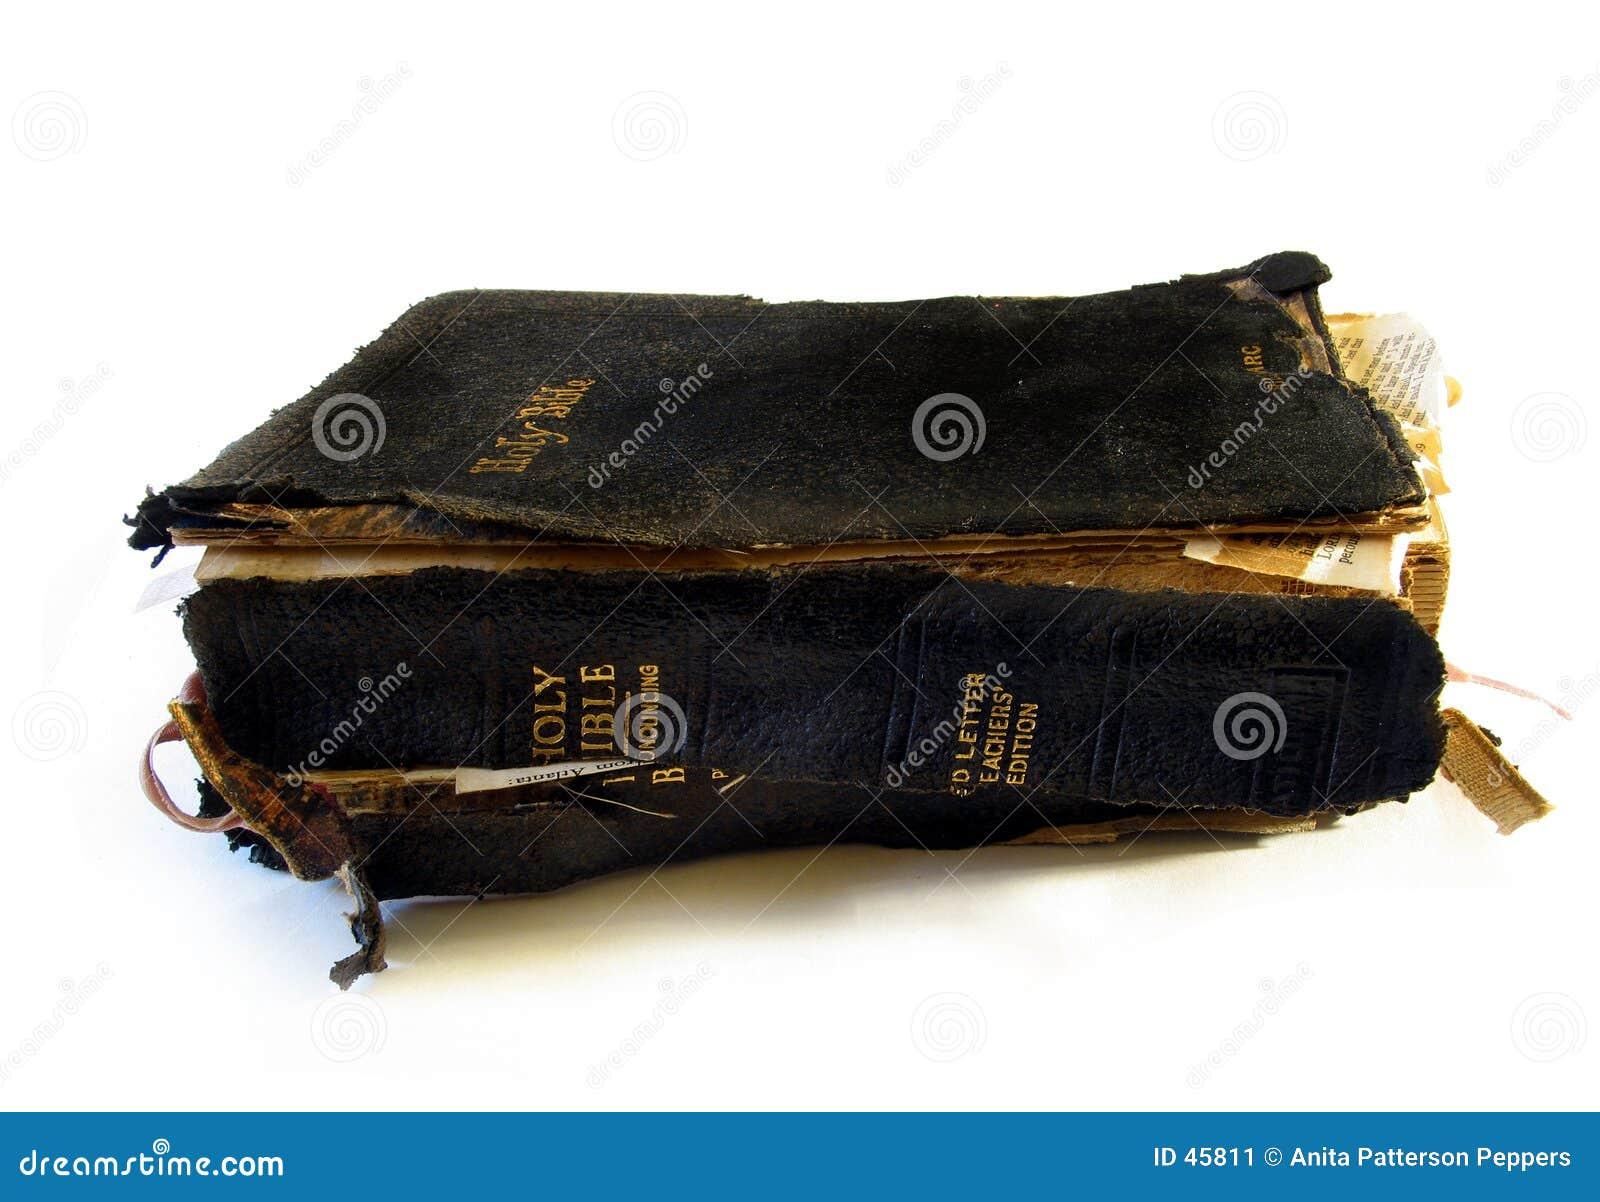 A Bíblia gasta